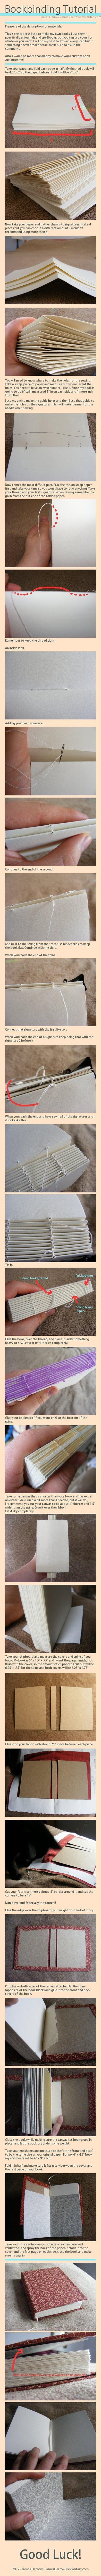 Book-binding Tuitorial